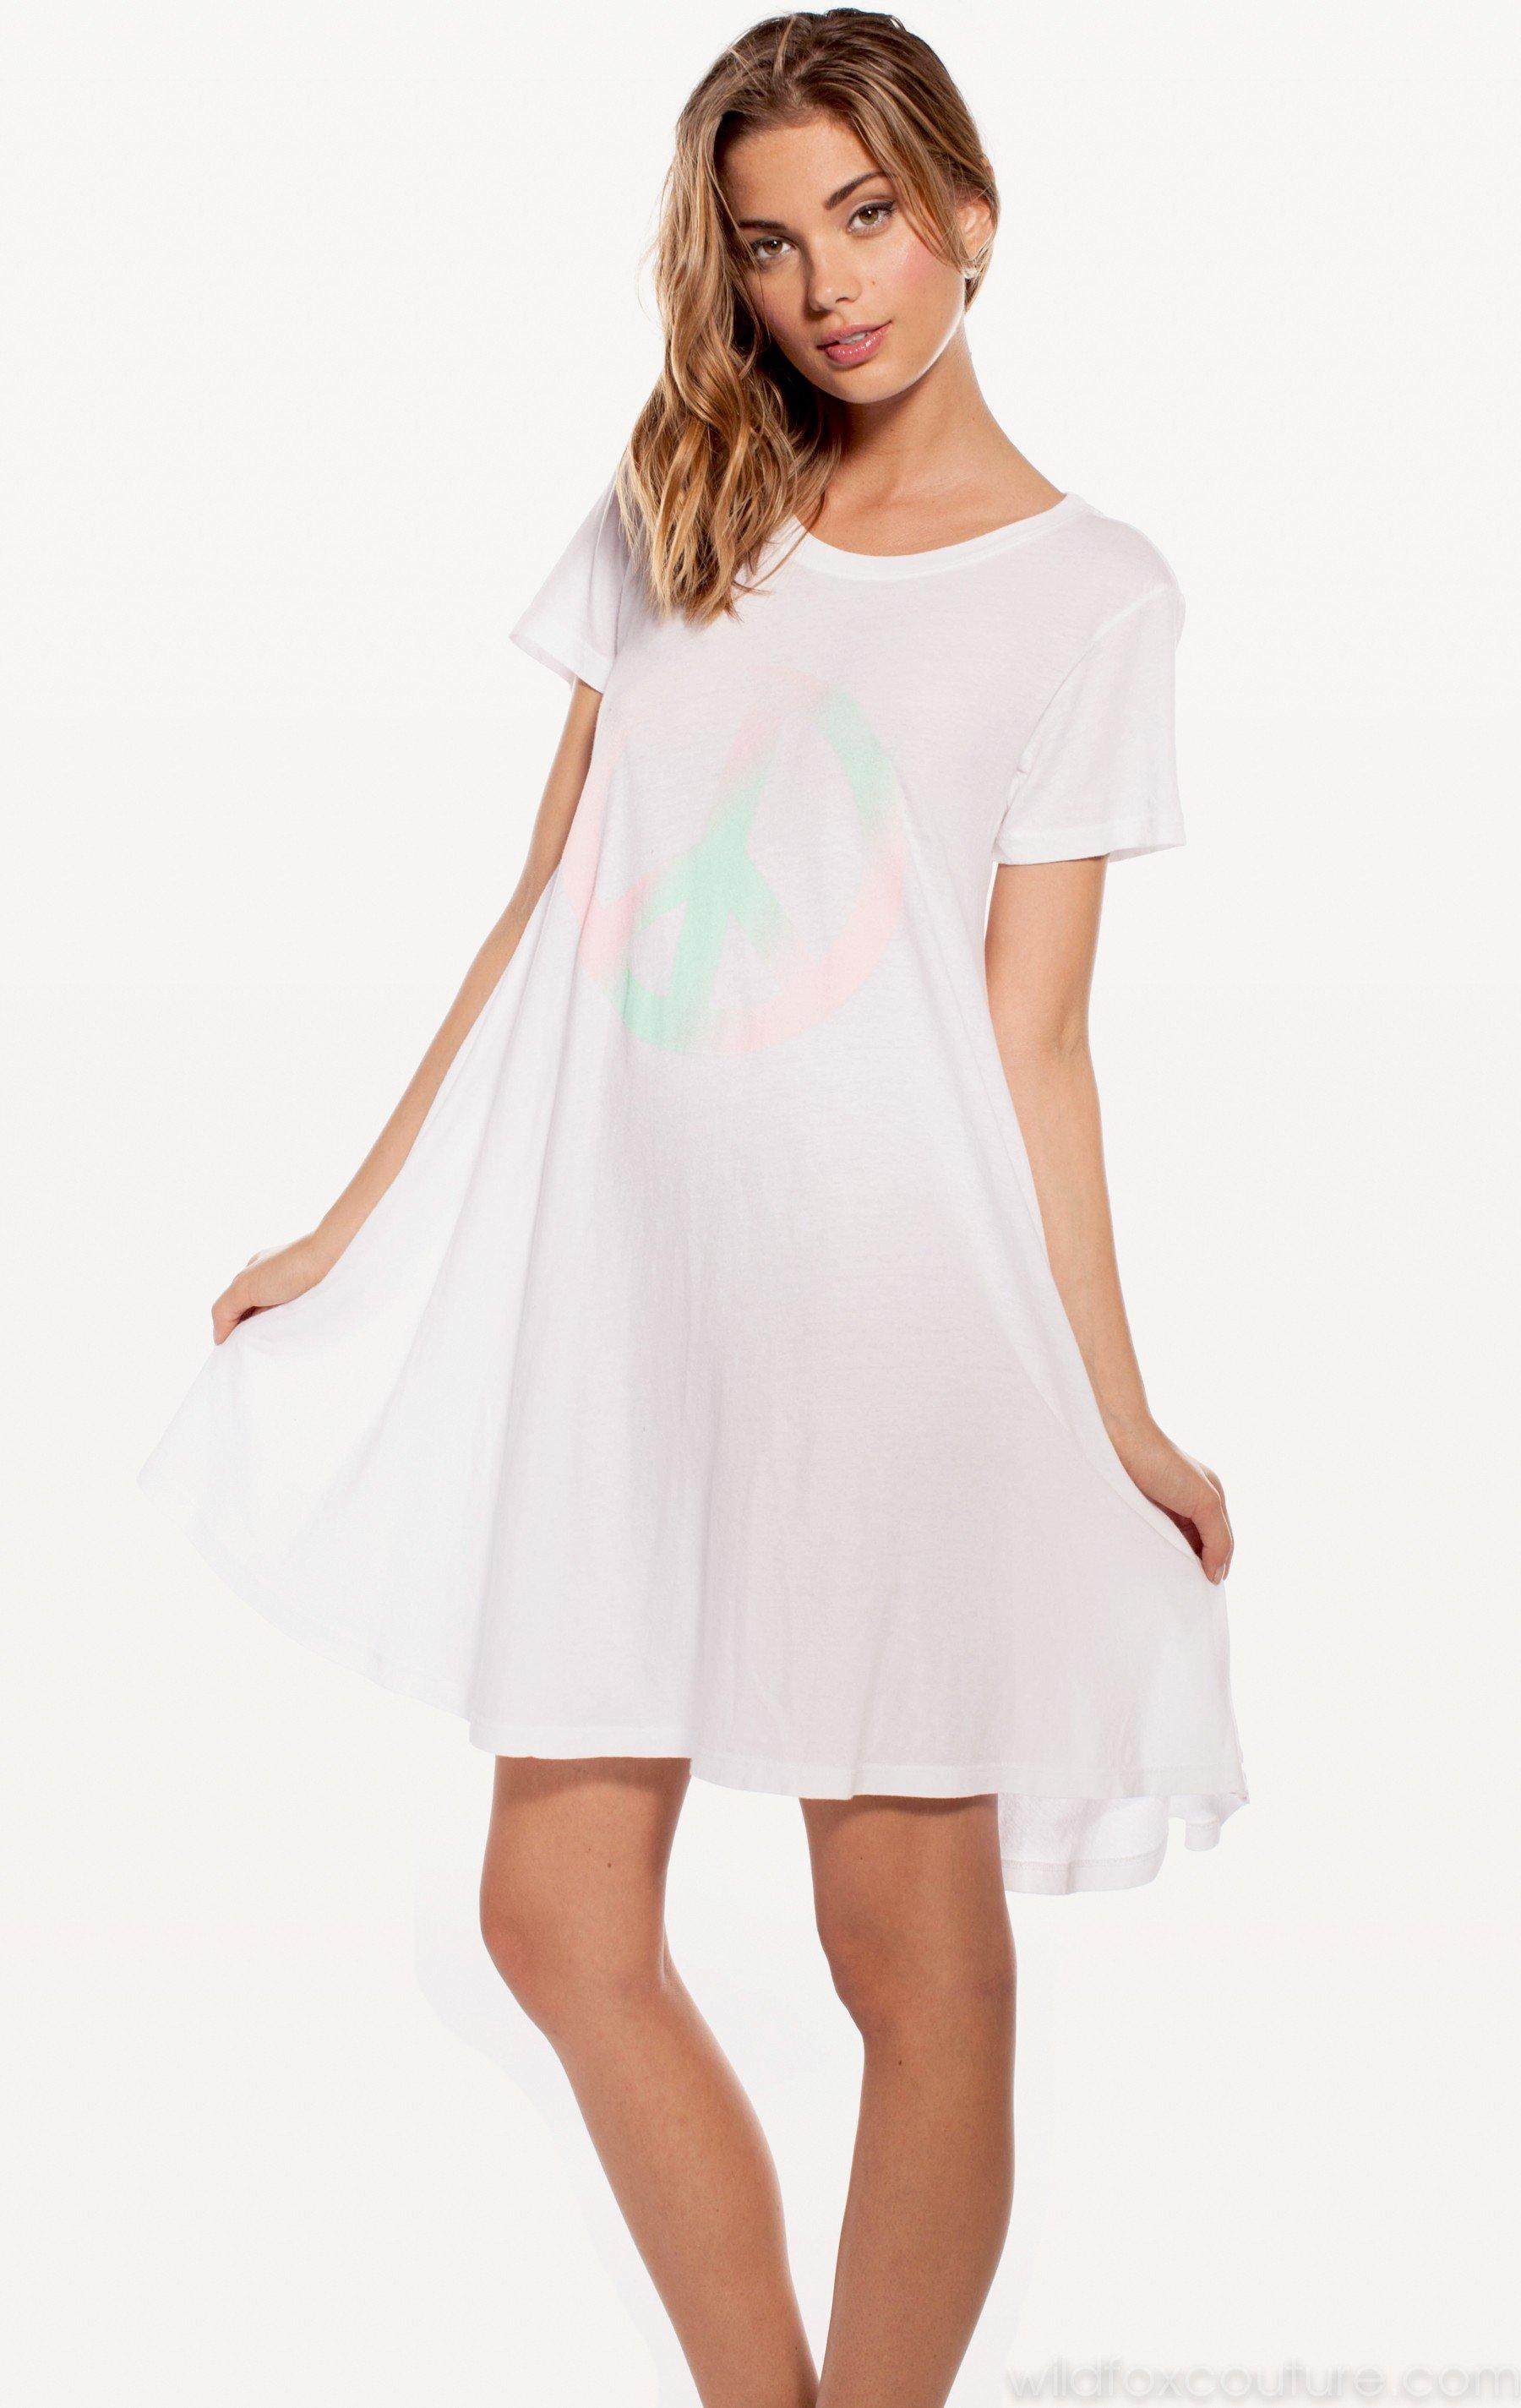 Babydoll Shirt Dress images